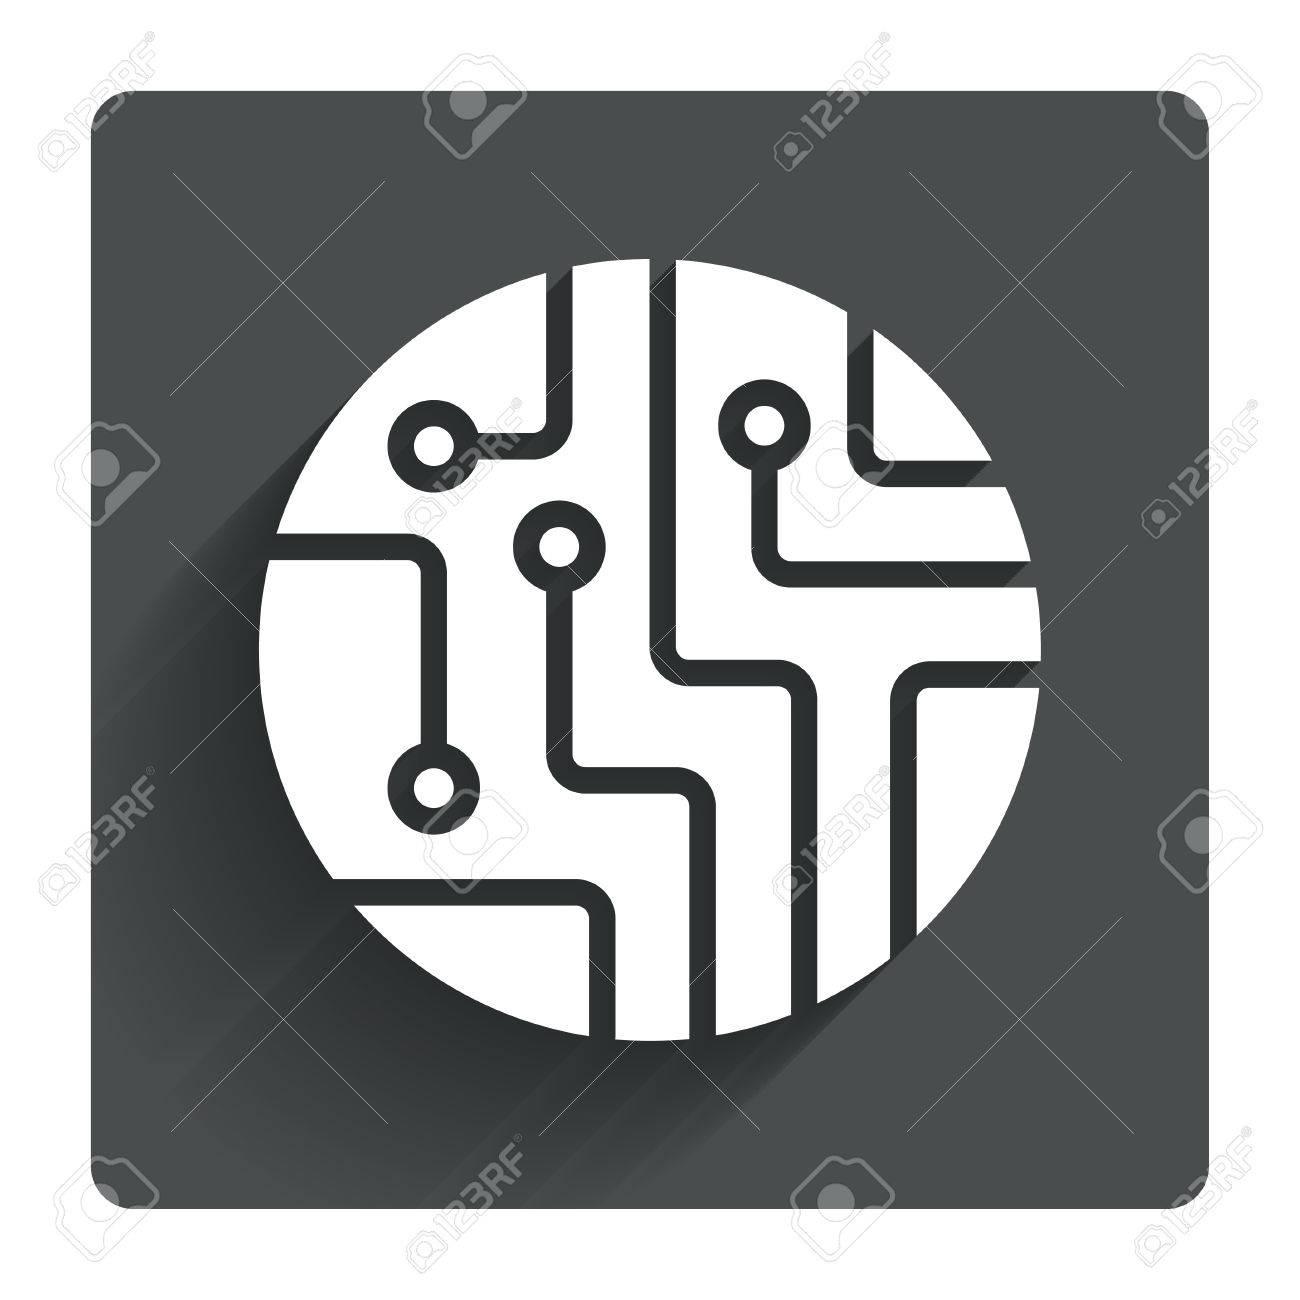 Funky Printed Circuit Board Symbol Crest - Wiring Diagram Ideas ...